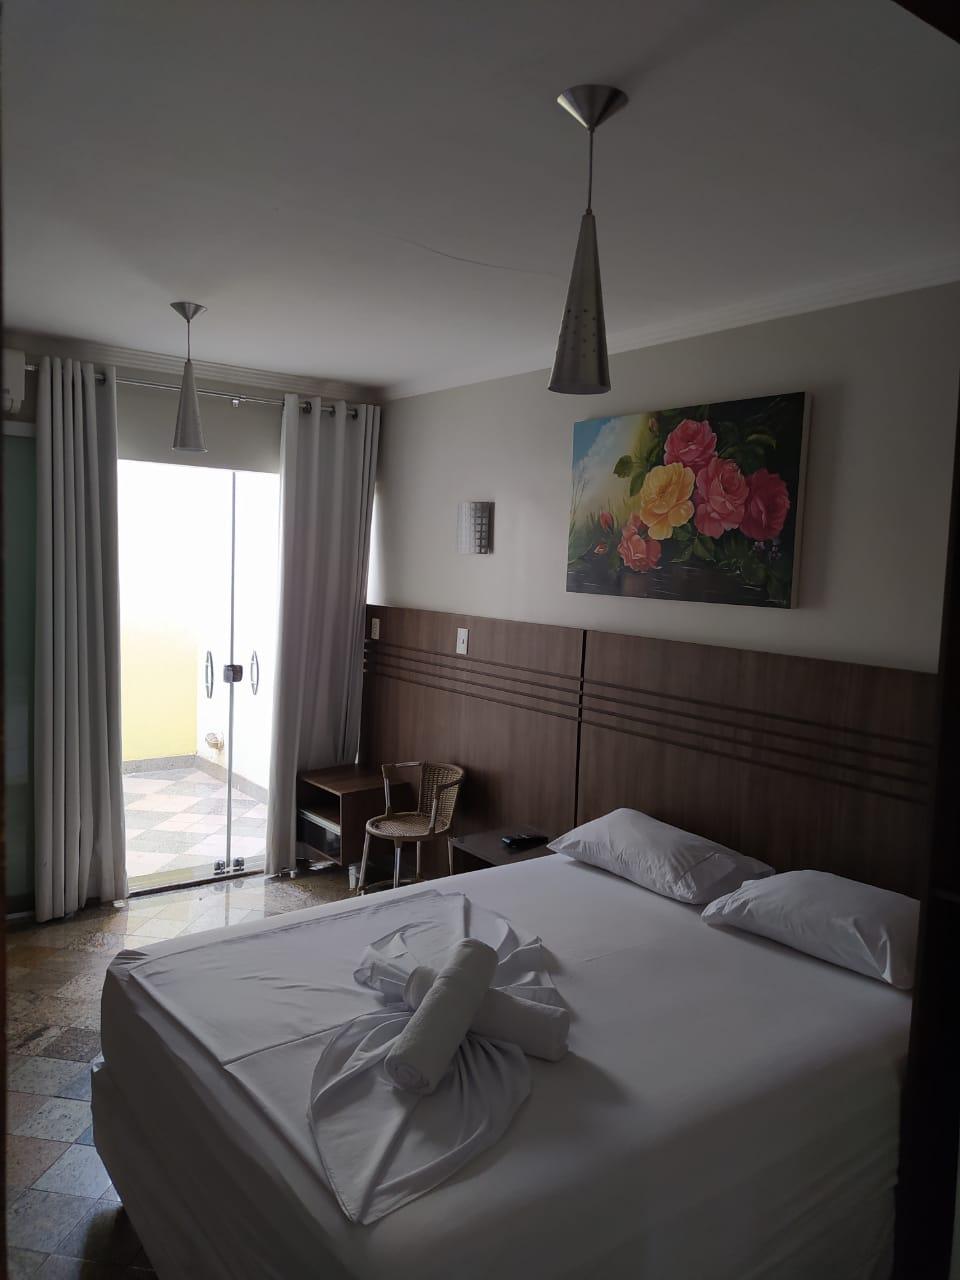 HOTEL-2 ALUGA SE FLATS MOBILLIADOS